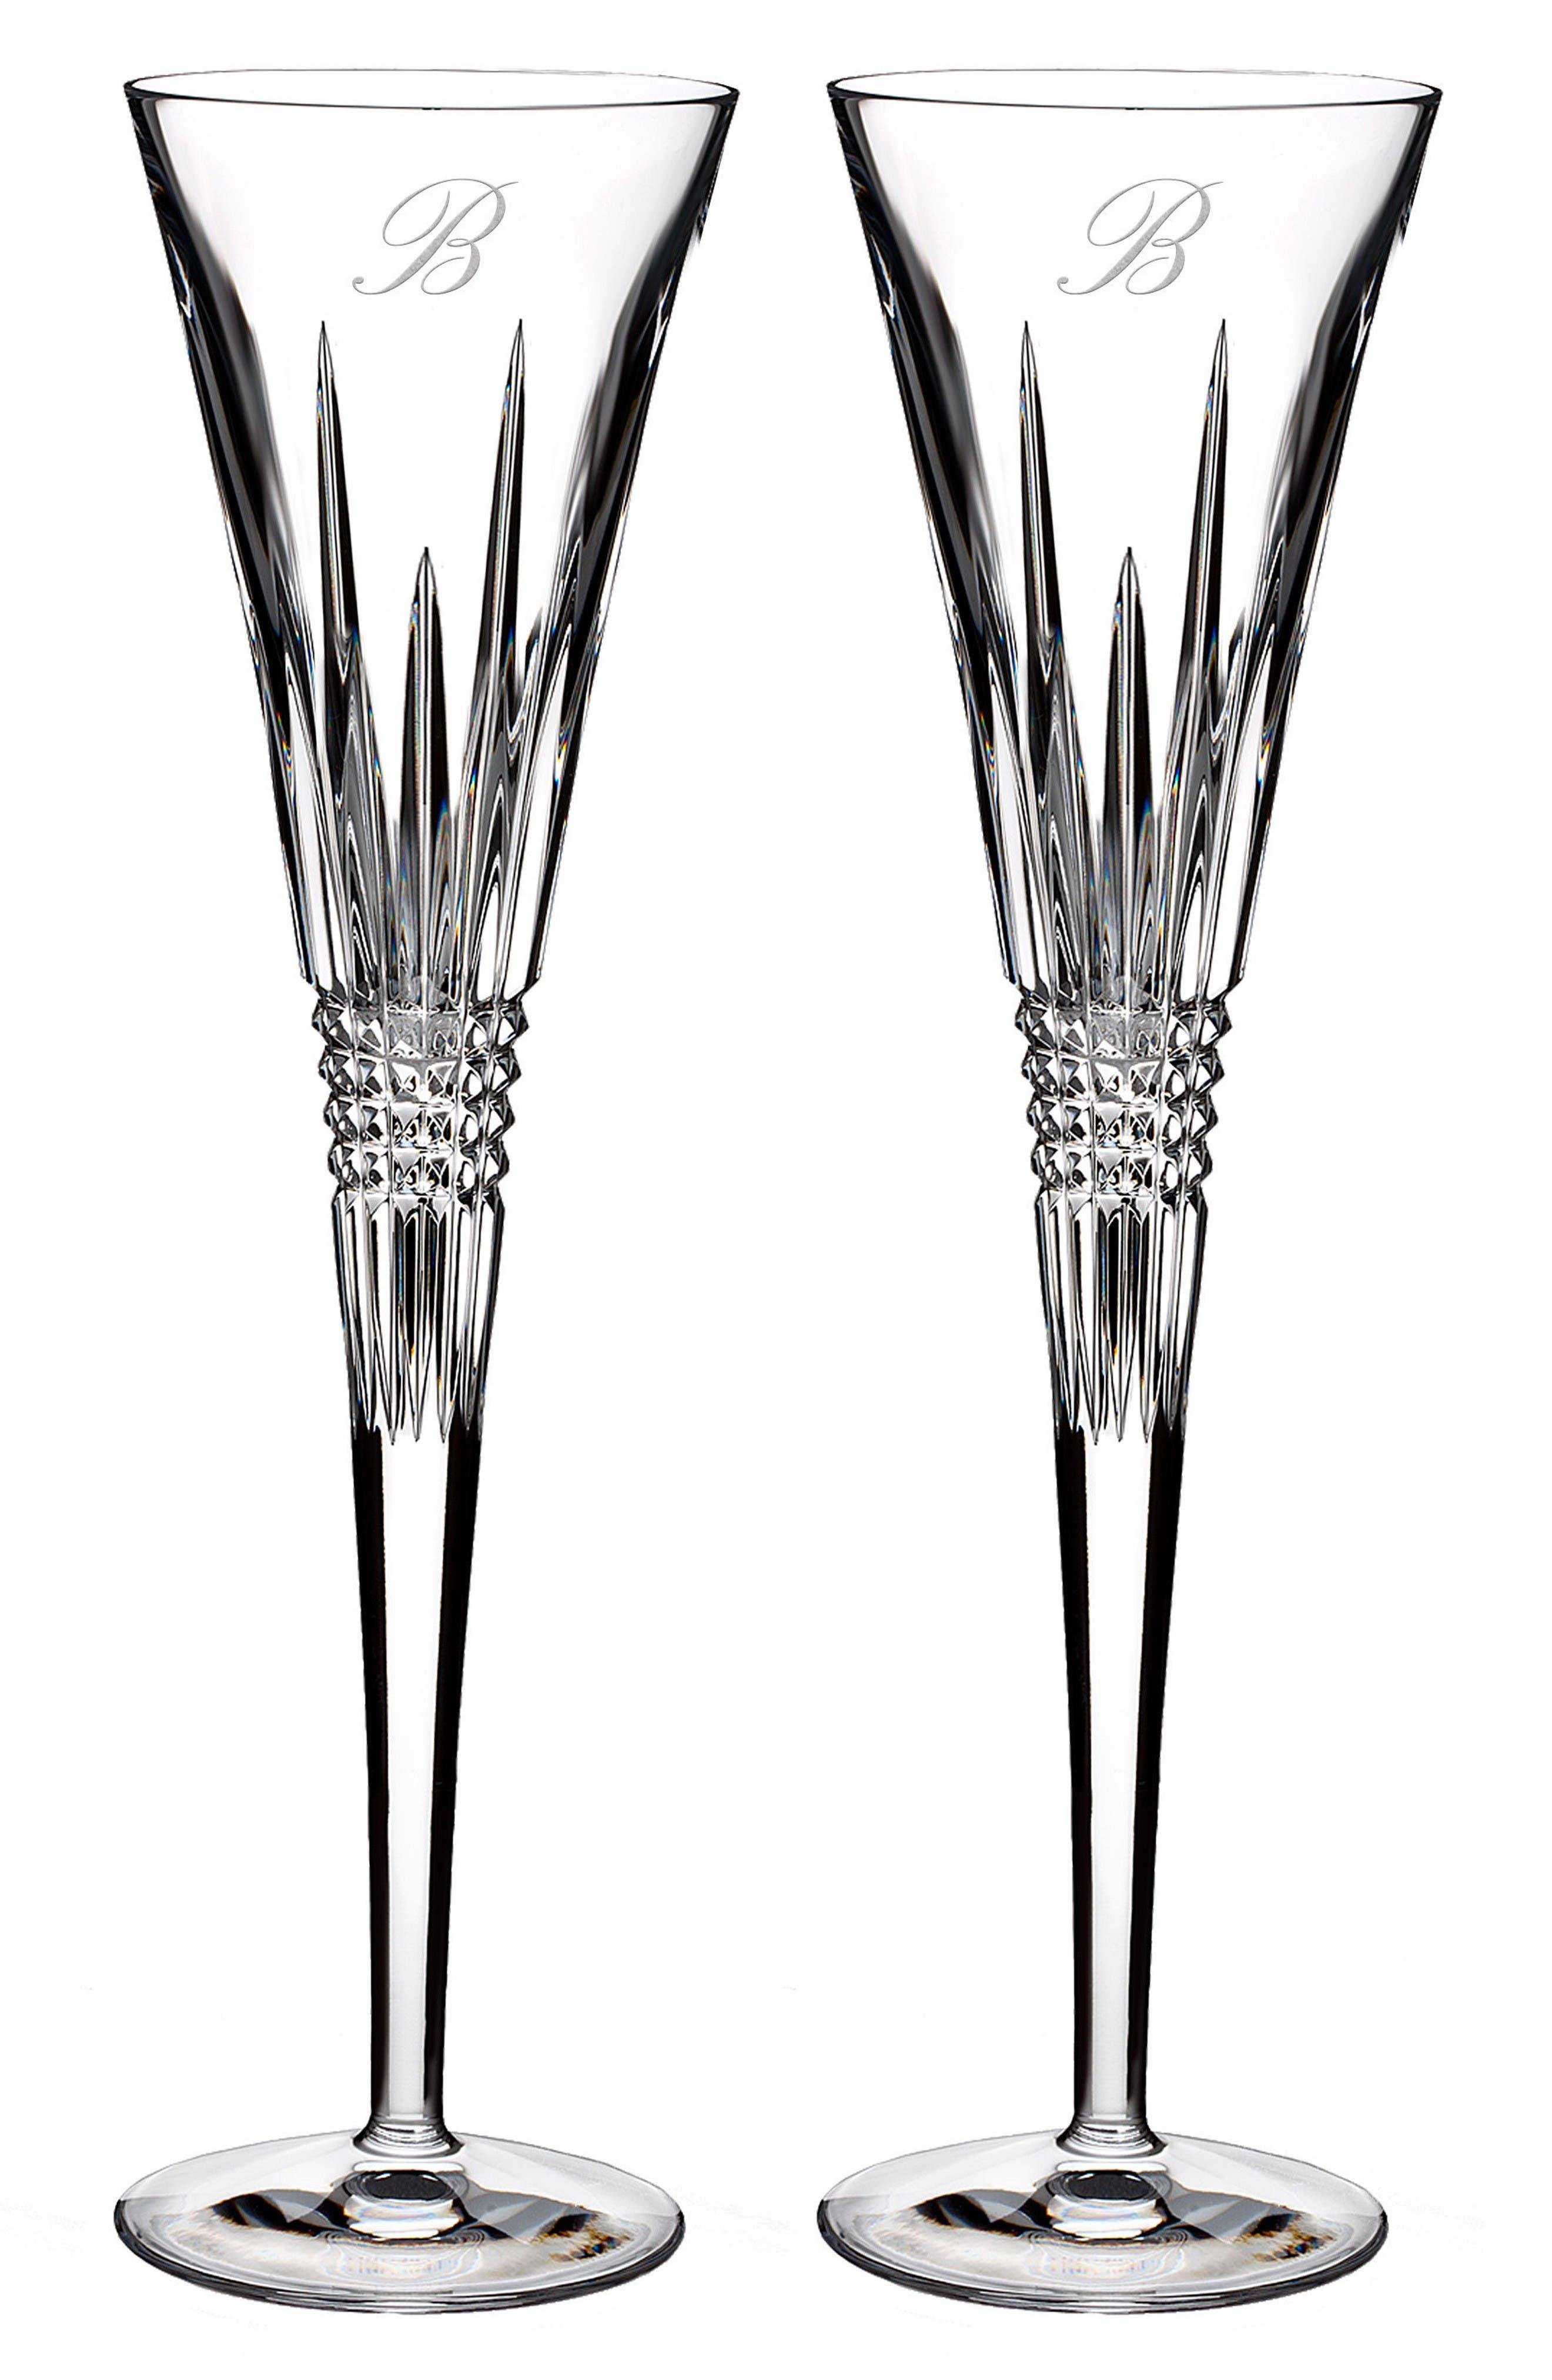 Main Image - Waterford Lismore Diamond Set of 2 Monogram Lead Crystal Champagne Flutes